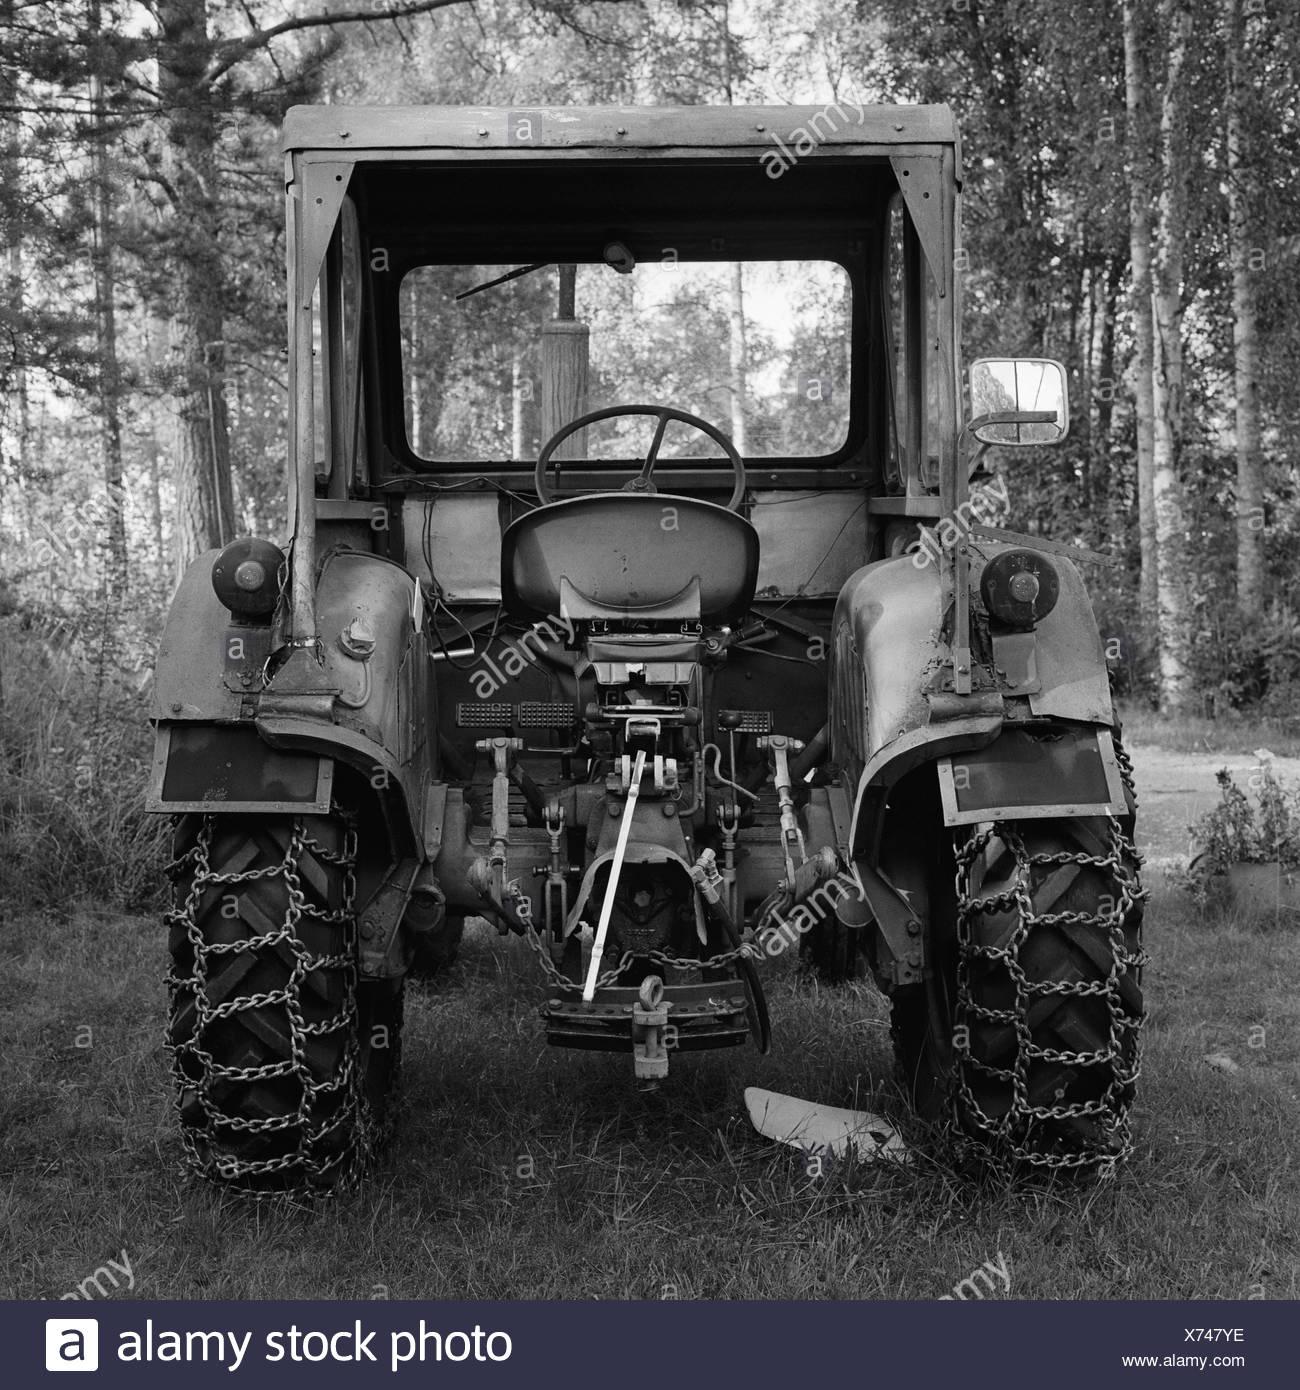 A tractor Malung Dalarna Sweden - Stock Image